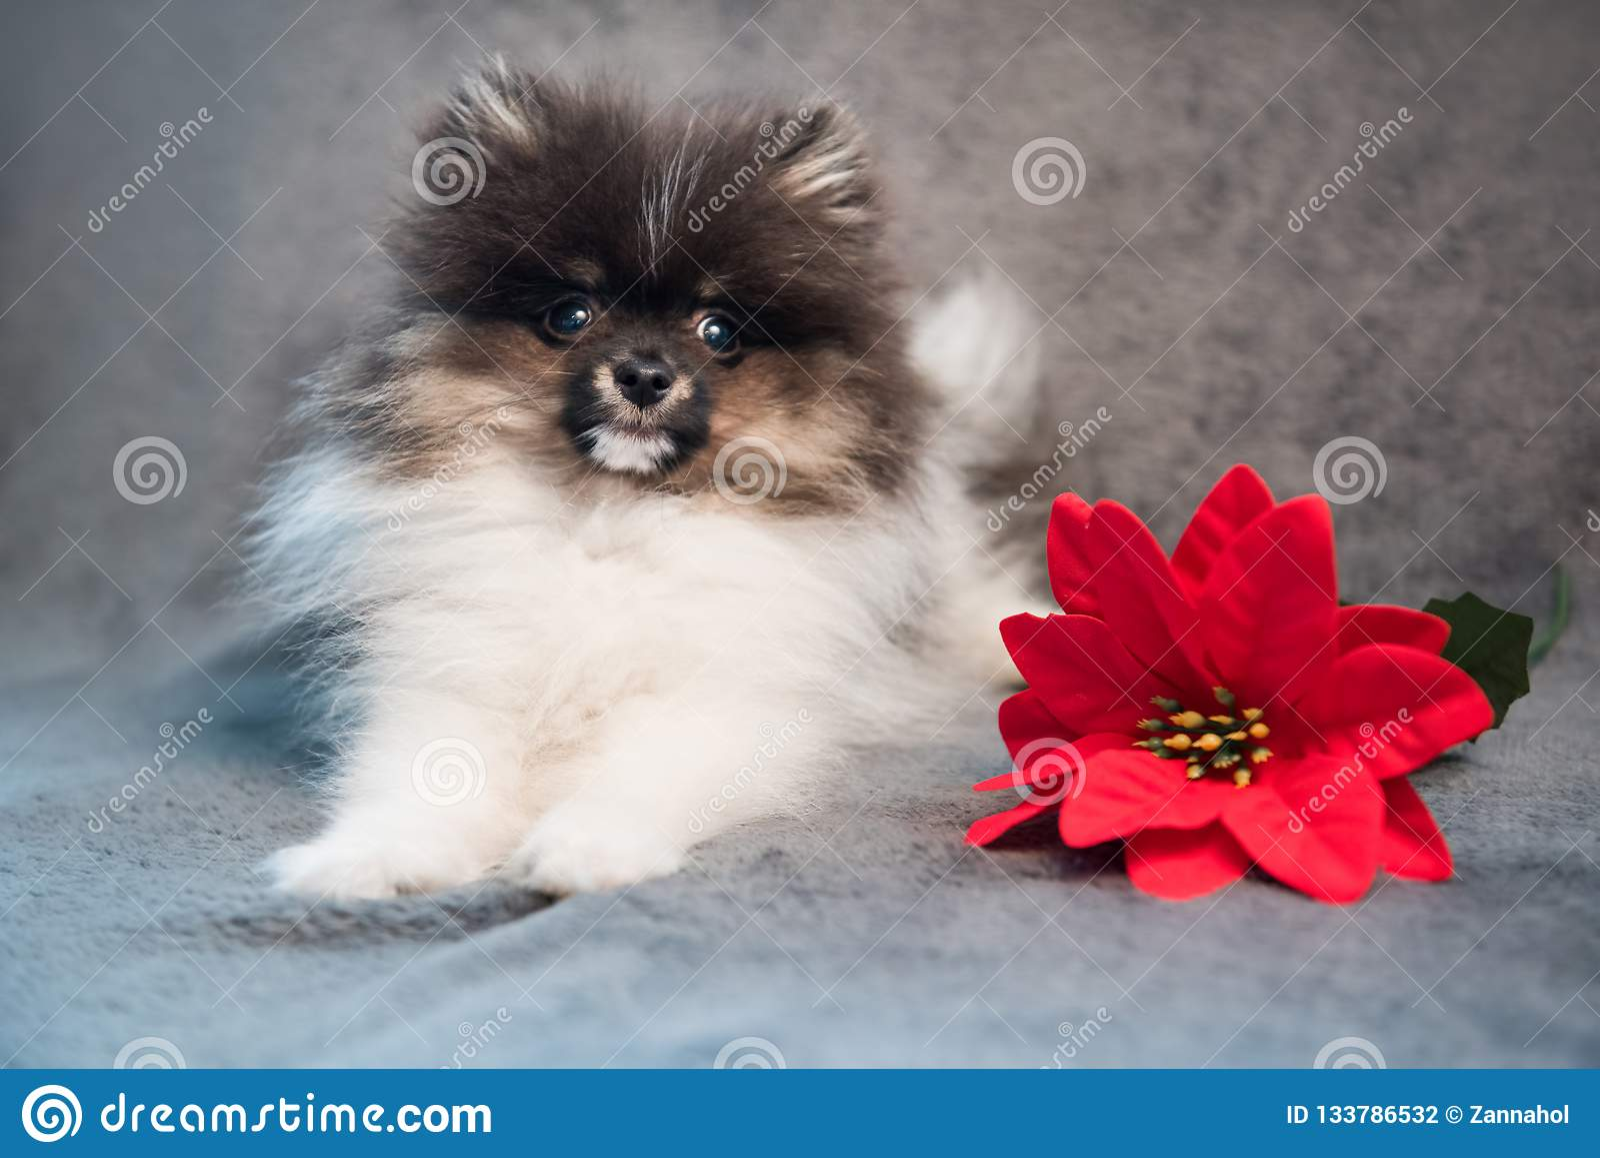 Pomeranian波美丝毛狗狗小狗和红色花在圣诞节